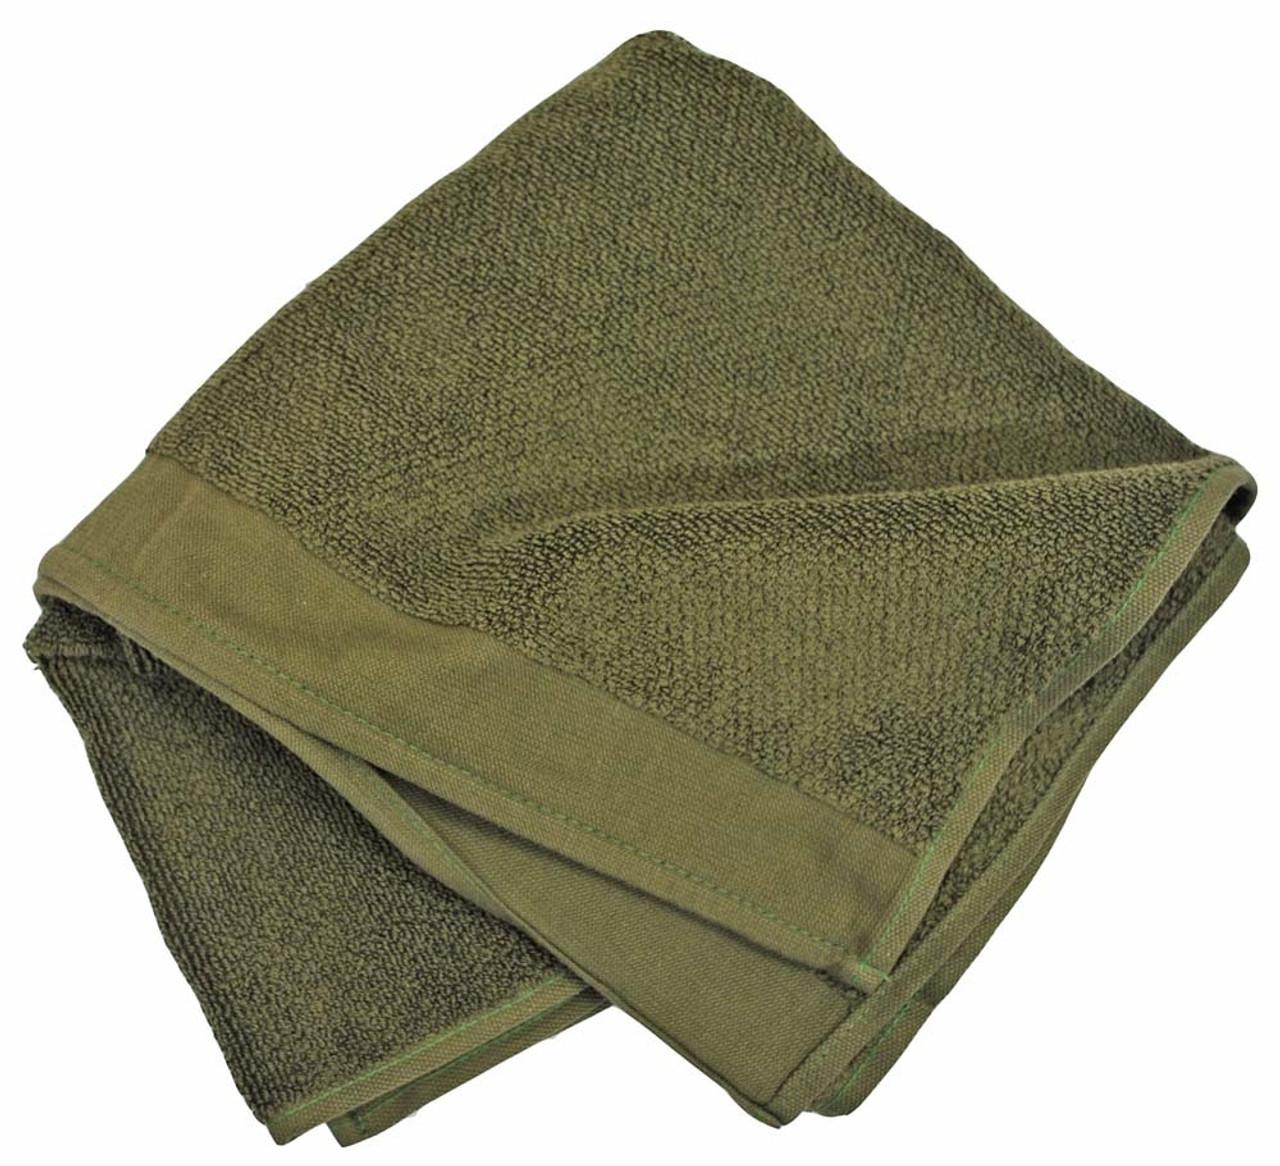 Repro Vietnam Era US Army Towel from Hessen Antique